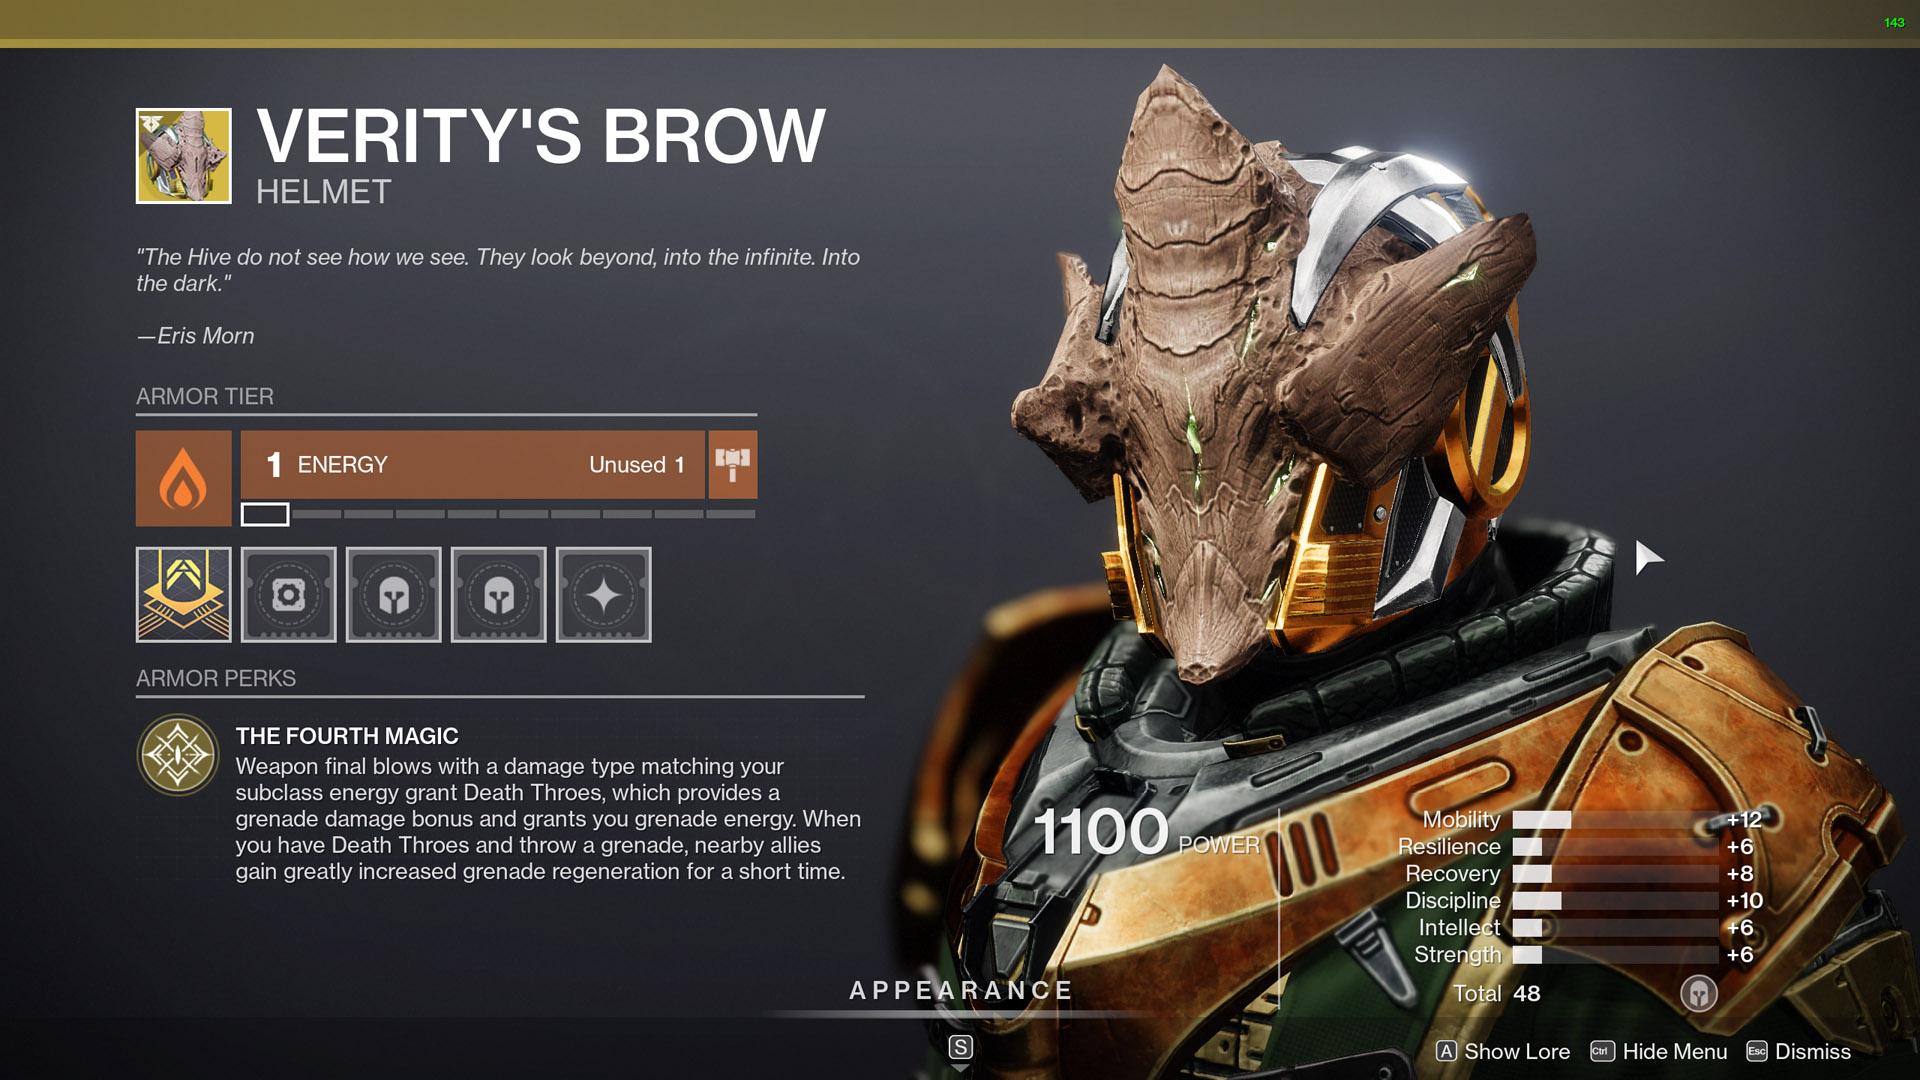 destiny 2 exotic warlock armor veritys brow